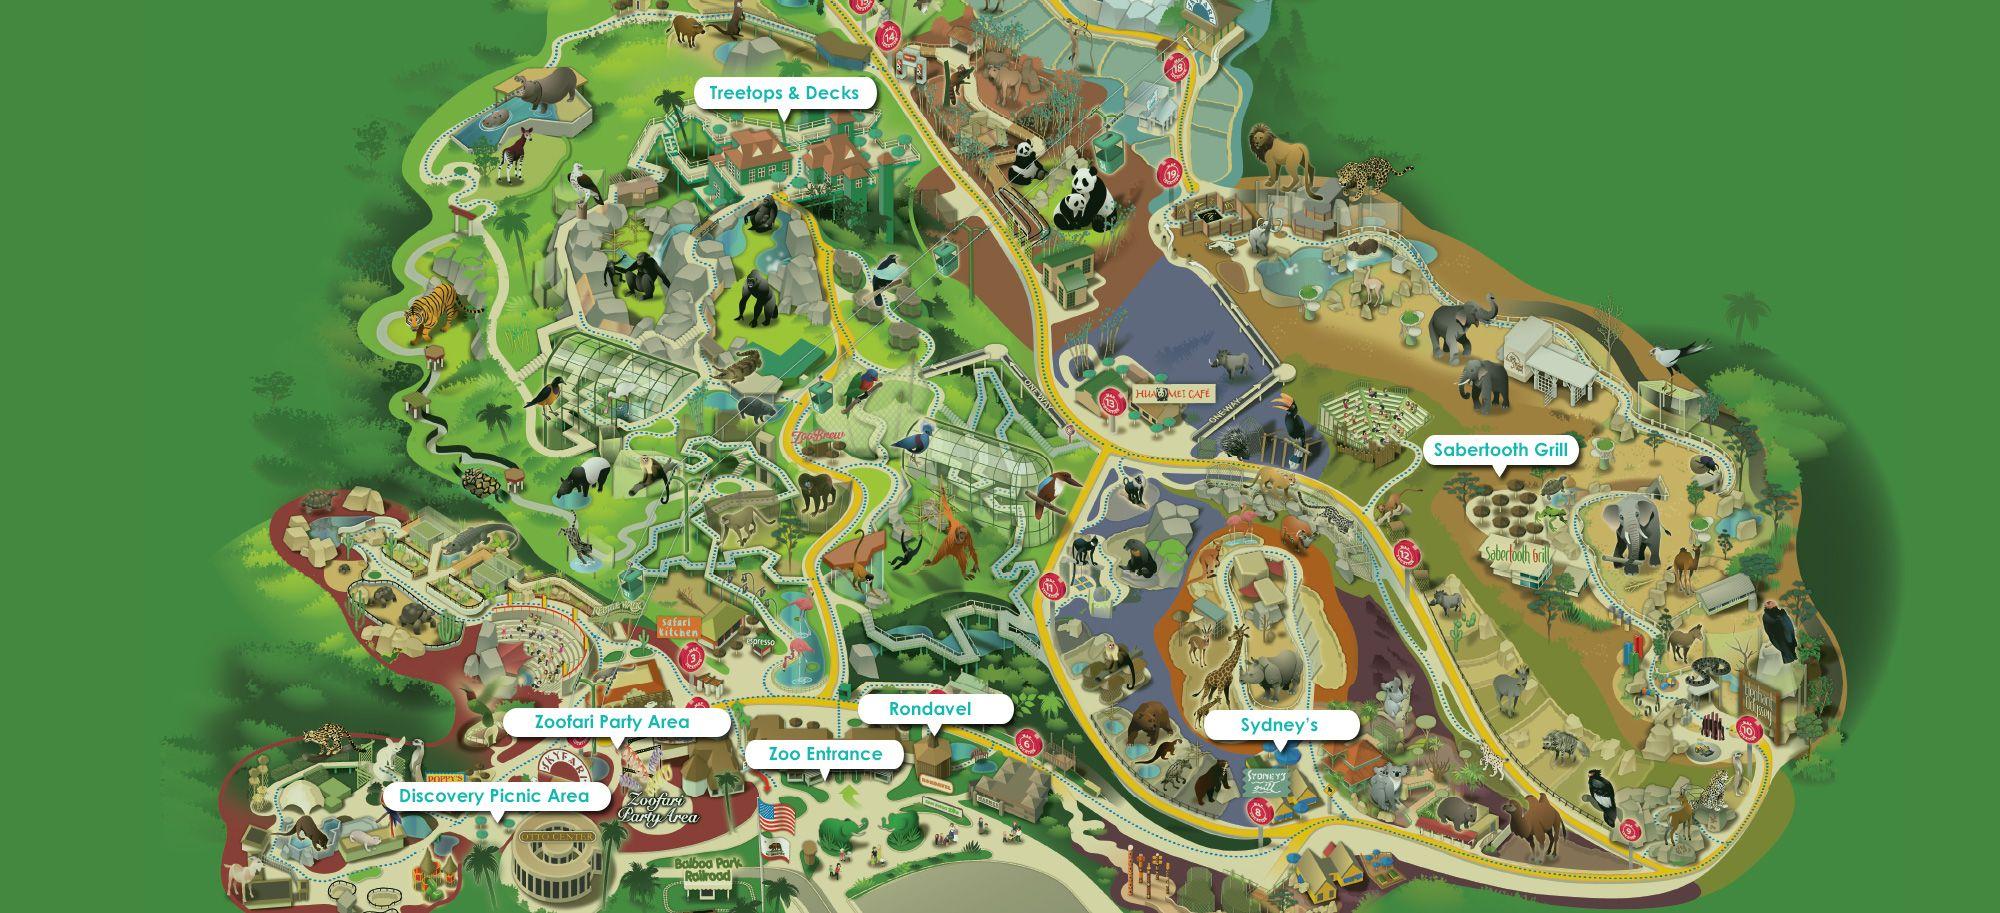 San Diego Zoo Venues San Diego Zoo Safari Park Events Maps - San diego zoo map